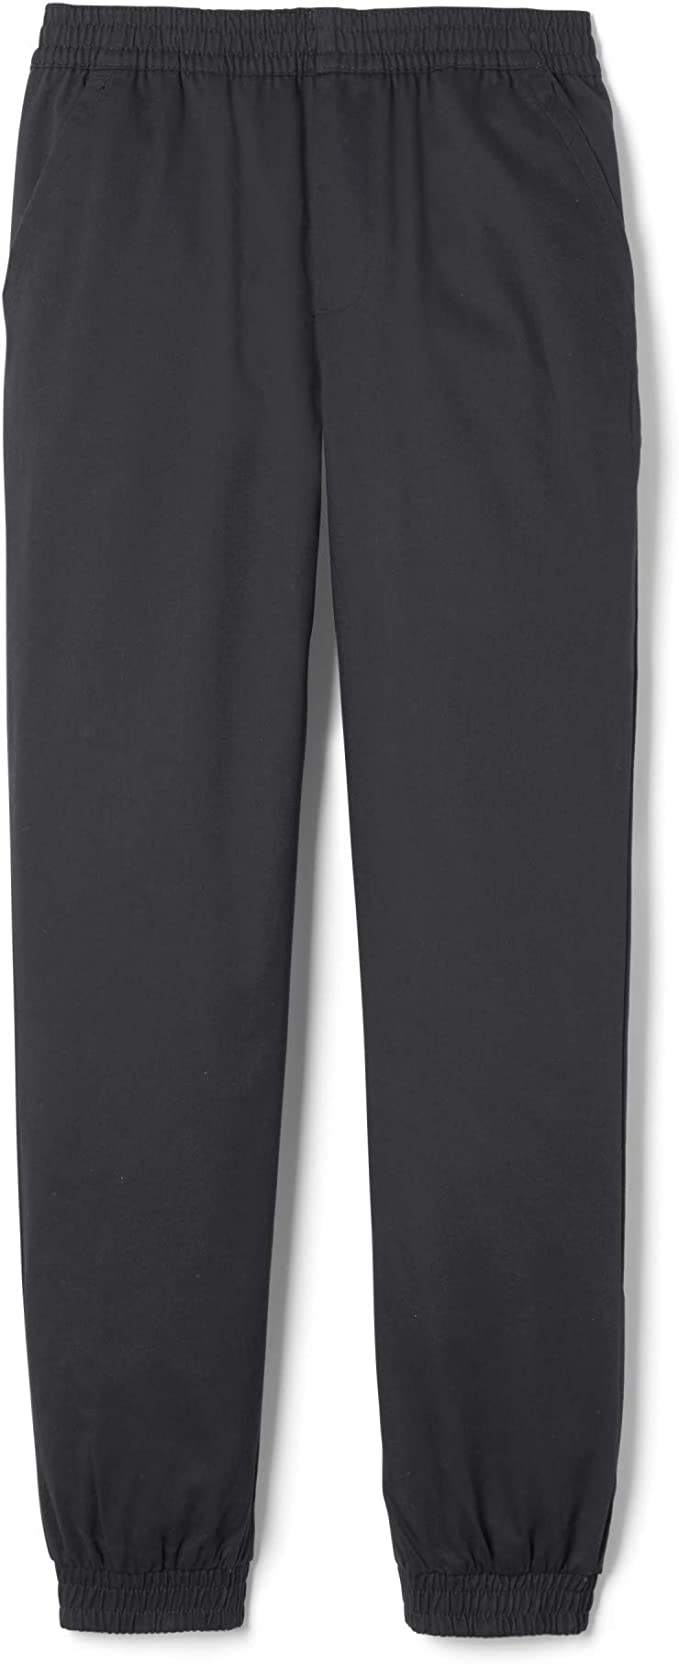 Boys Khaki Pull-on Jogger French Toast School Uniform Sizes 8 to 20